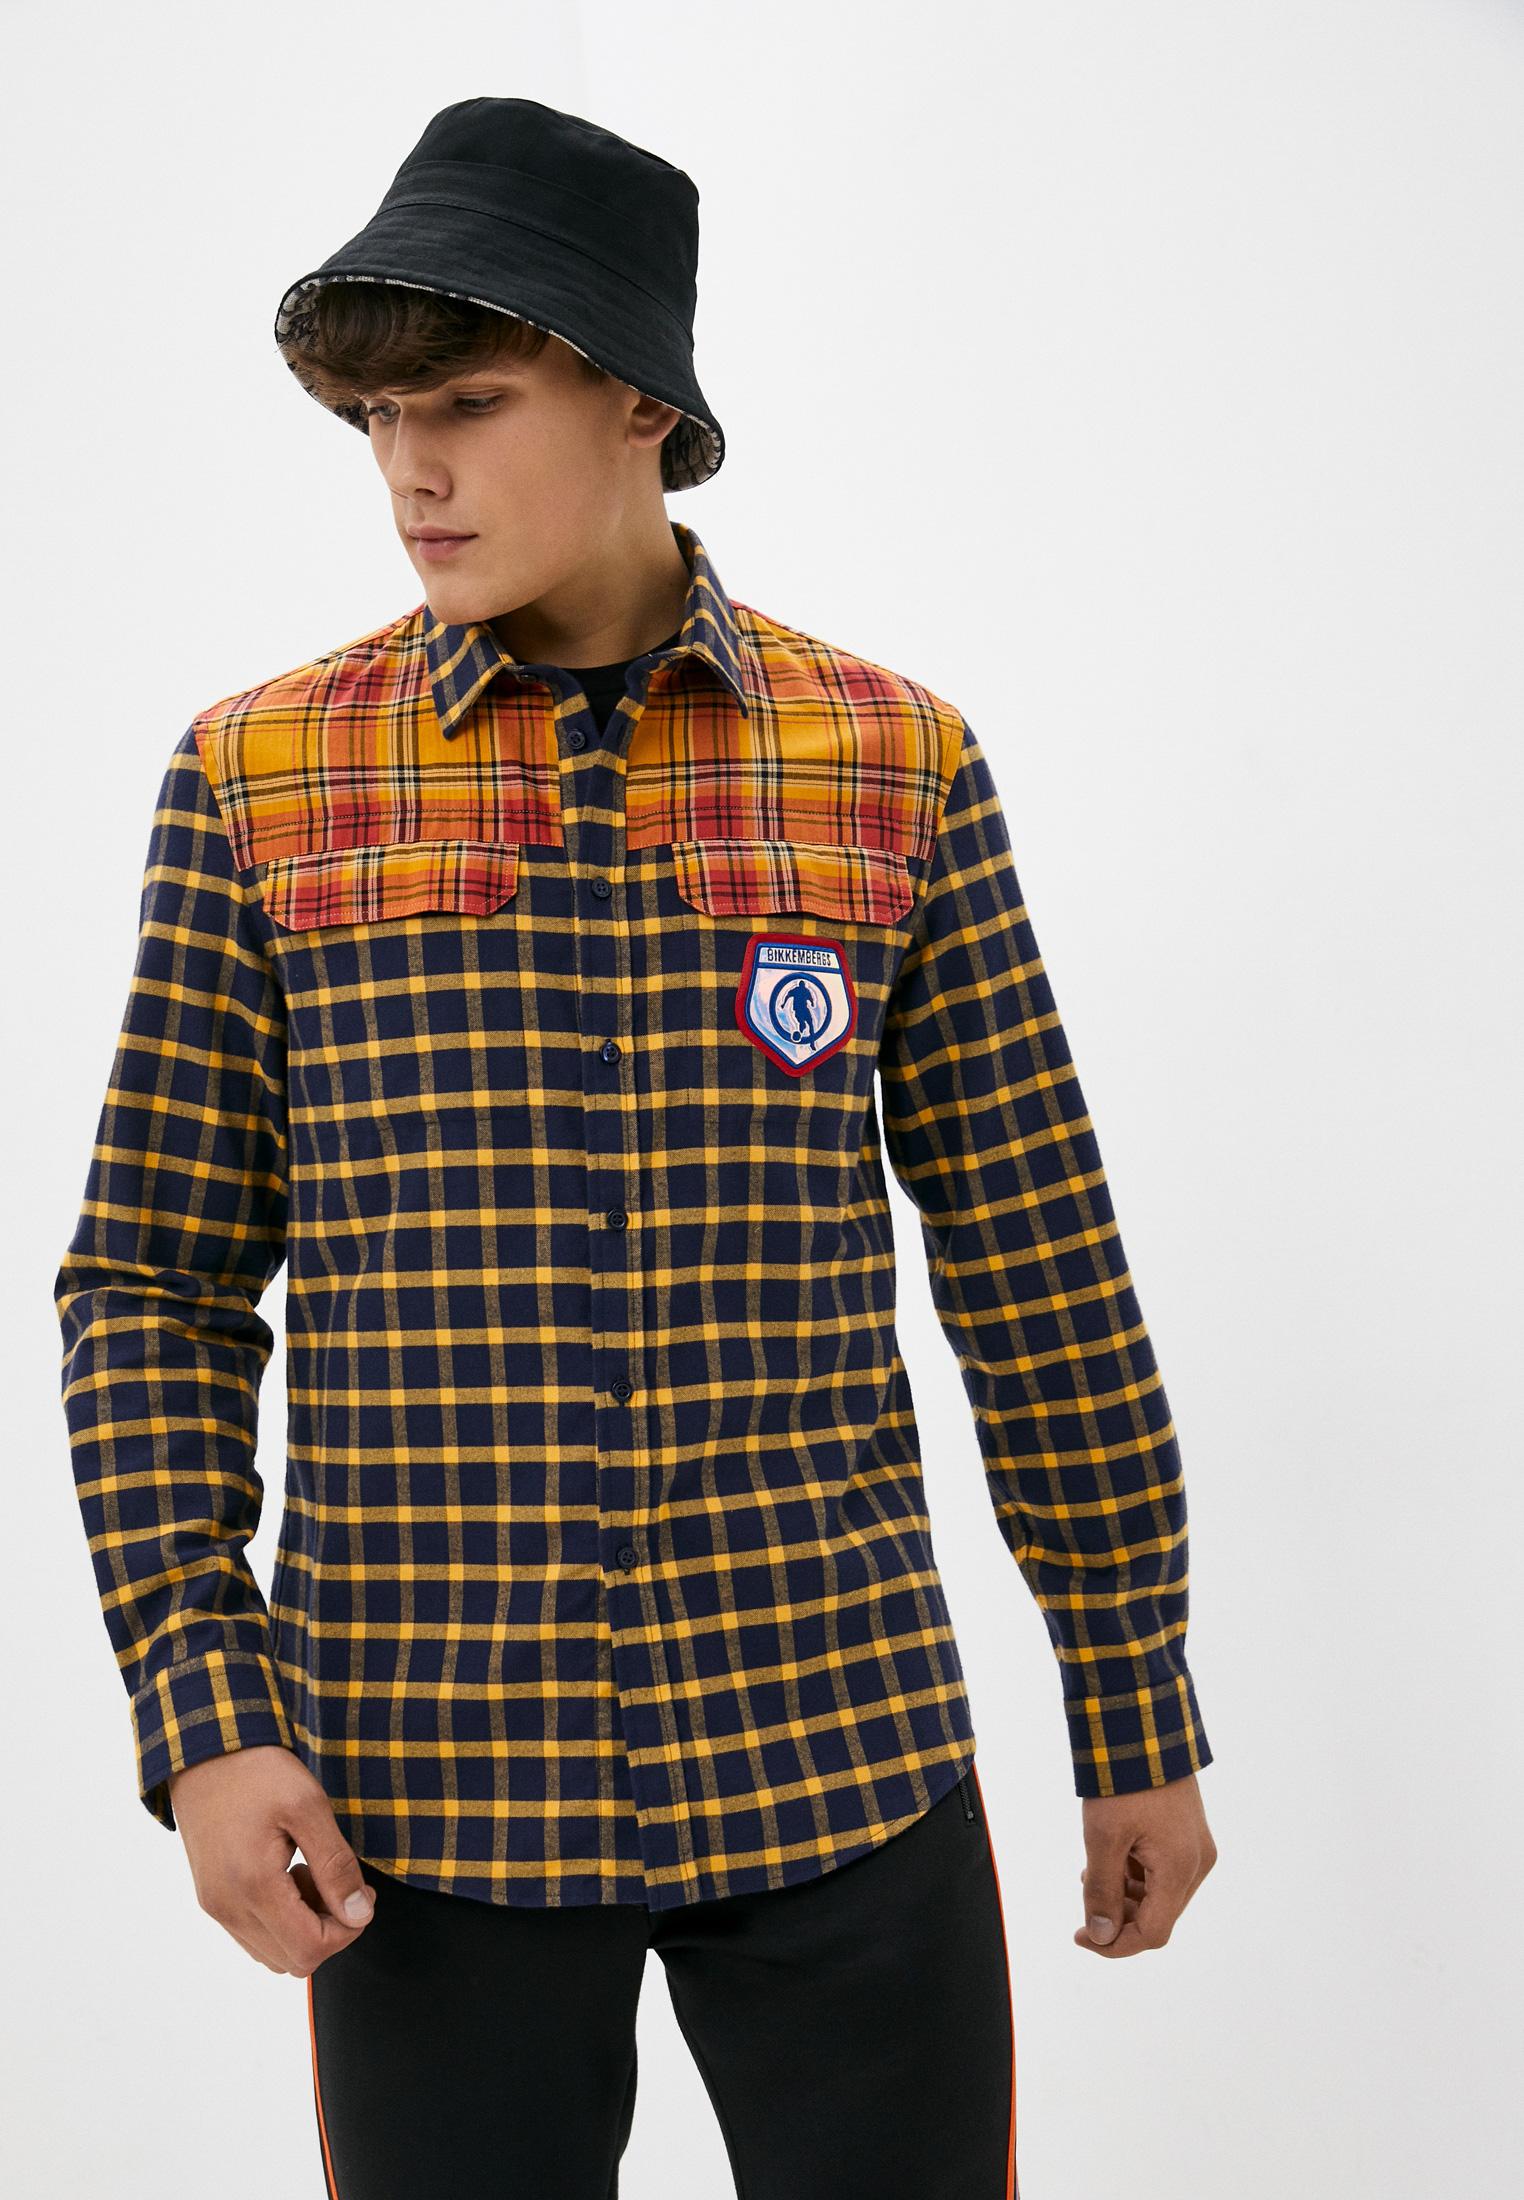 Рубашка с длинным рукавом Bikkembergs (Биккембергс) C C 061 80 T 9876